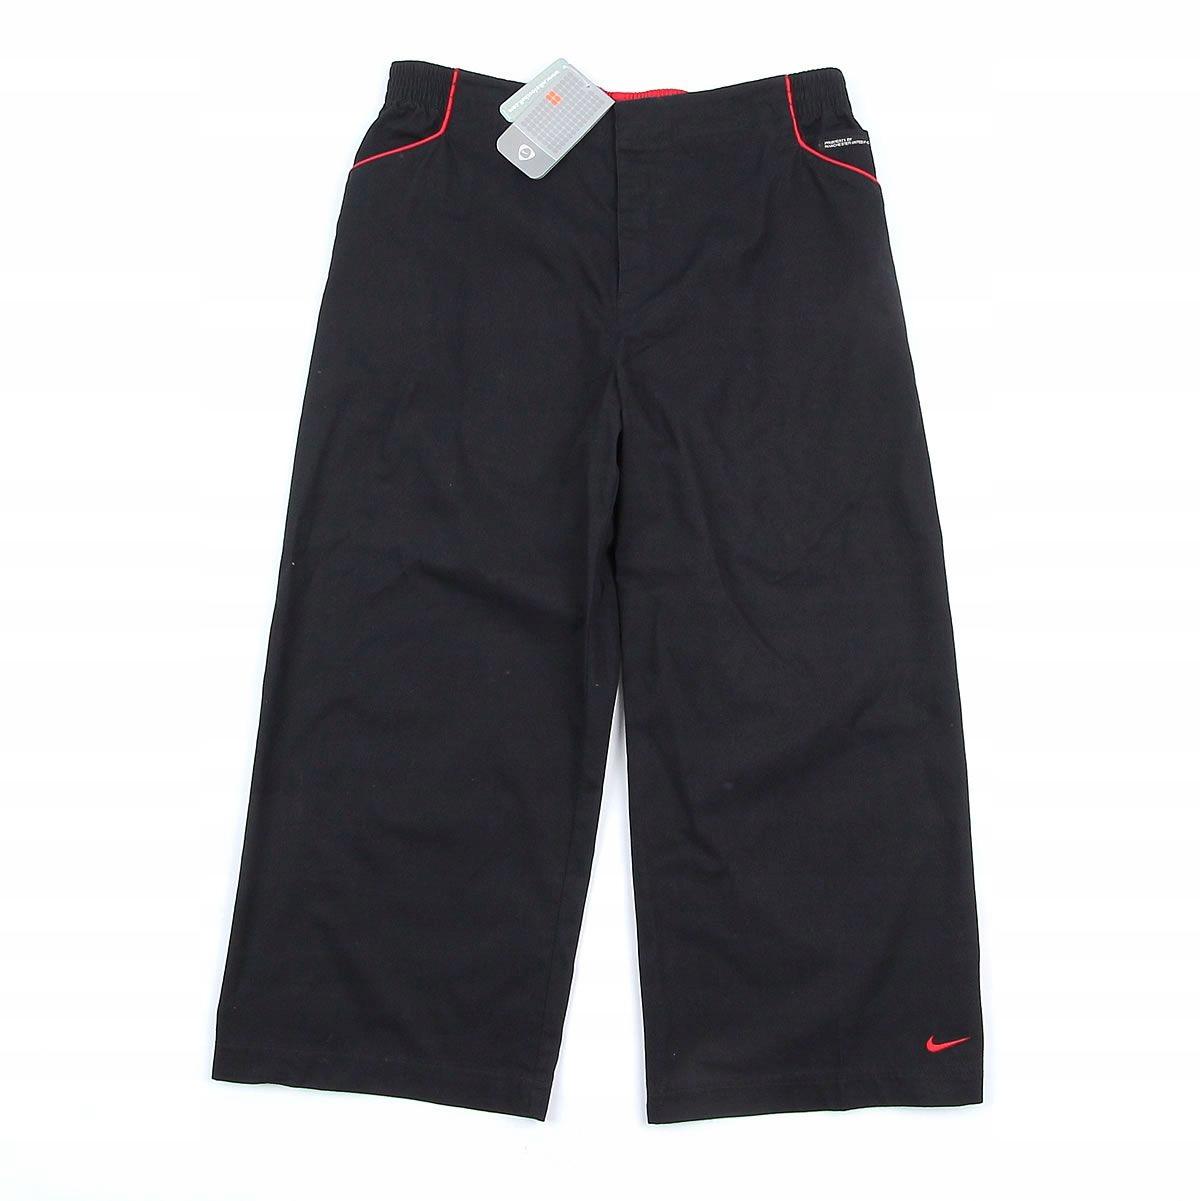 Spodnie 7/8 męskie Nike Manchester United - M